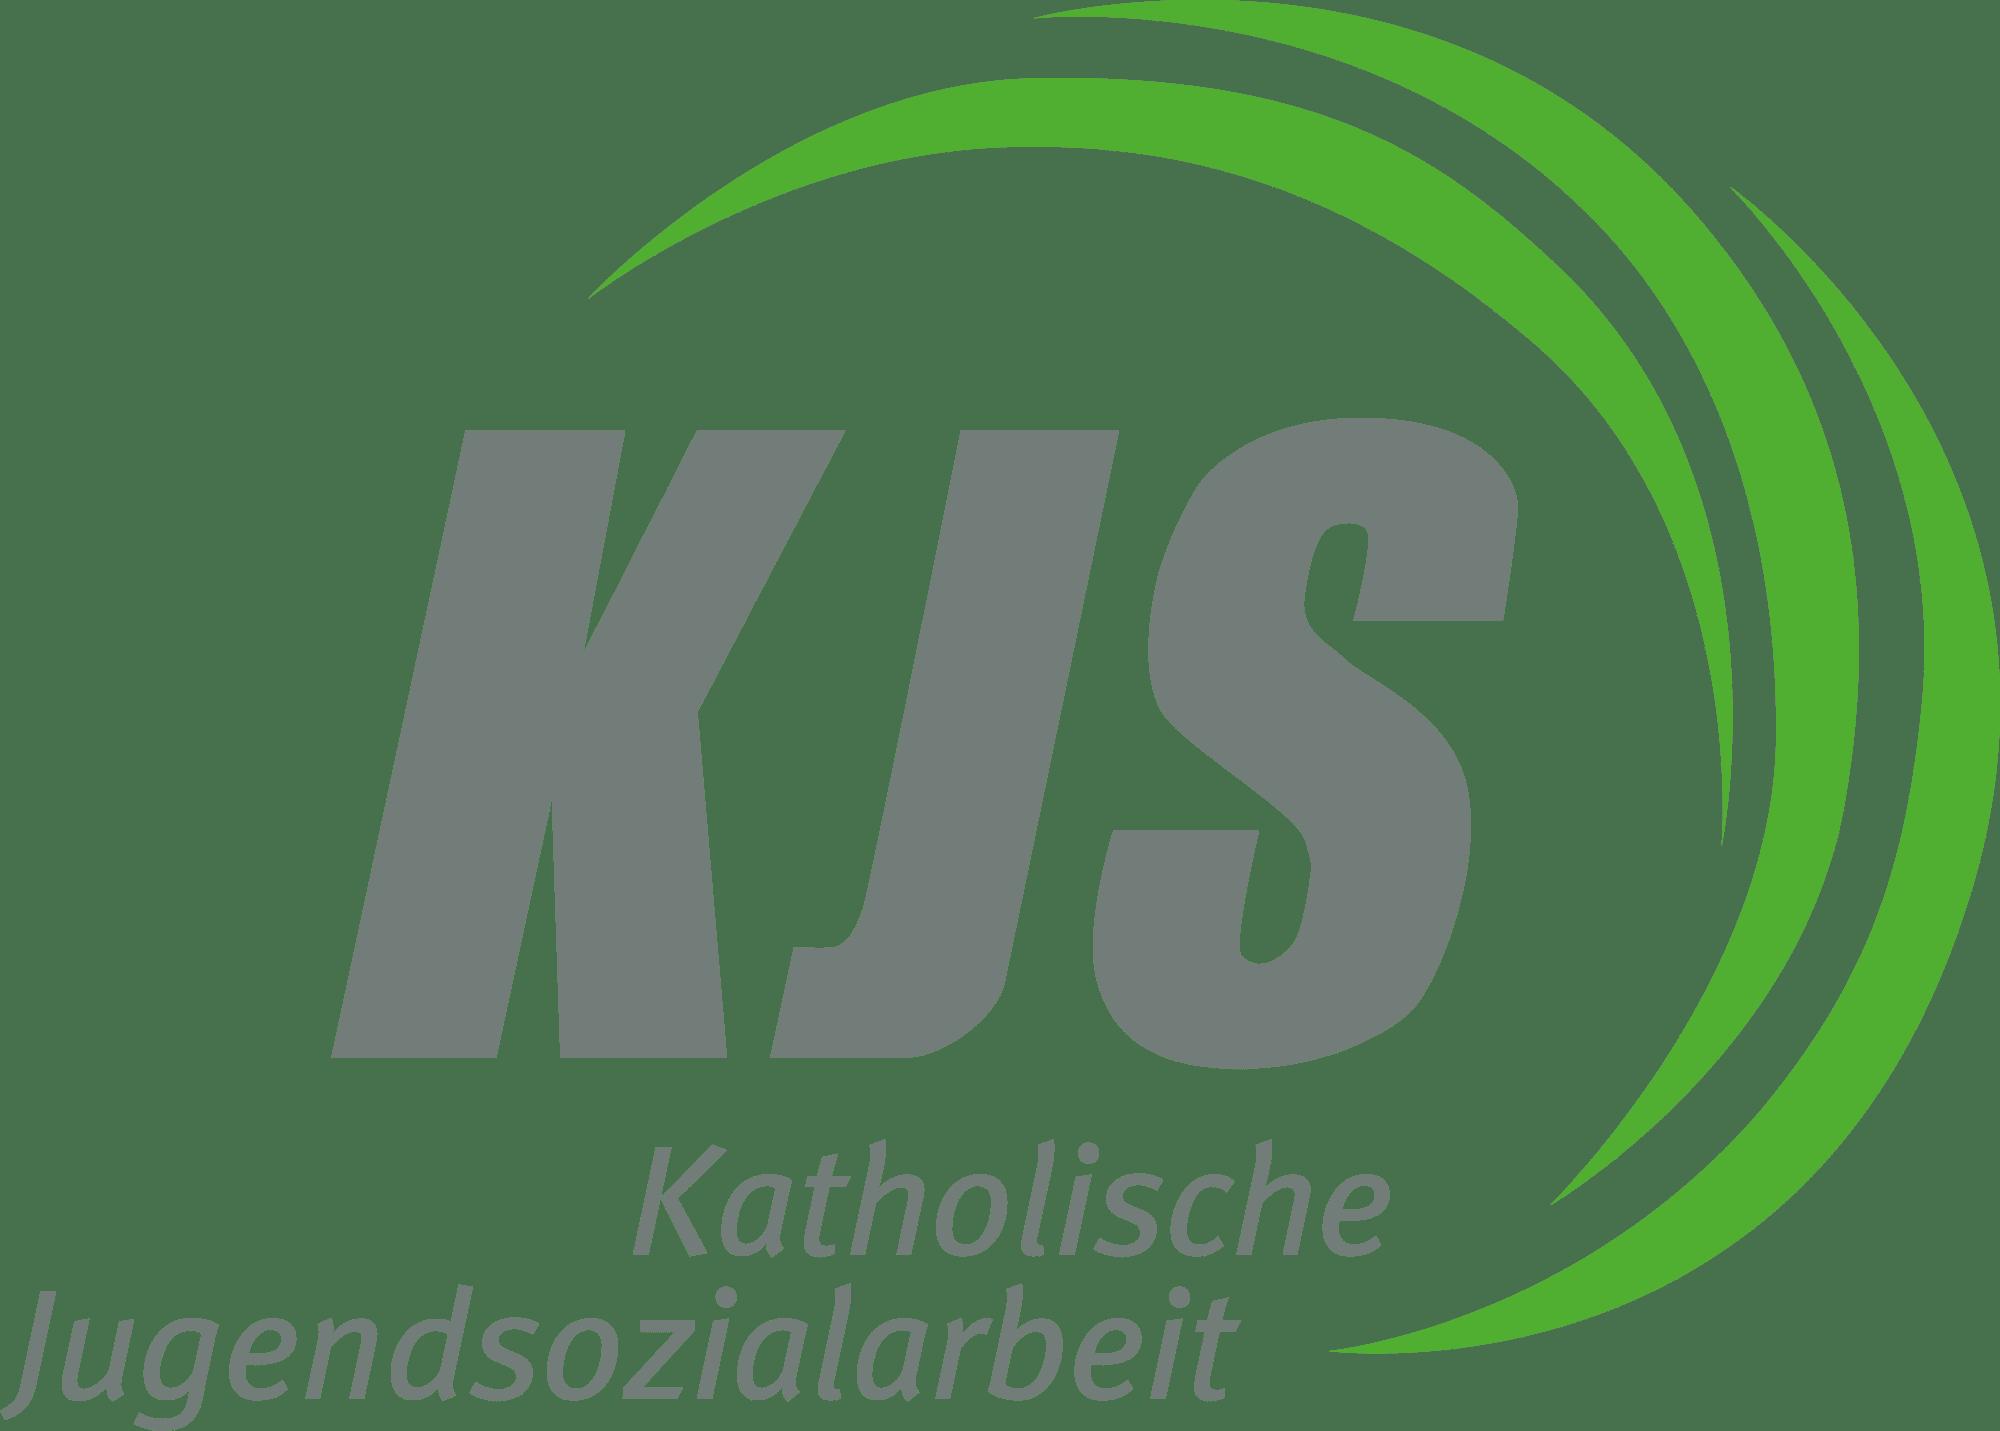 Bundesarbeitsgemeinschaft Katholische Jugendsozialarbeit (BAG KJS) e.V.